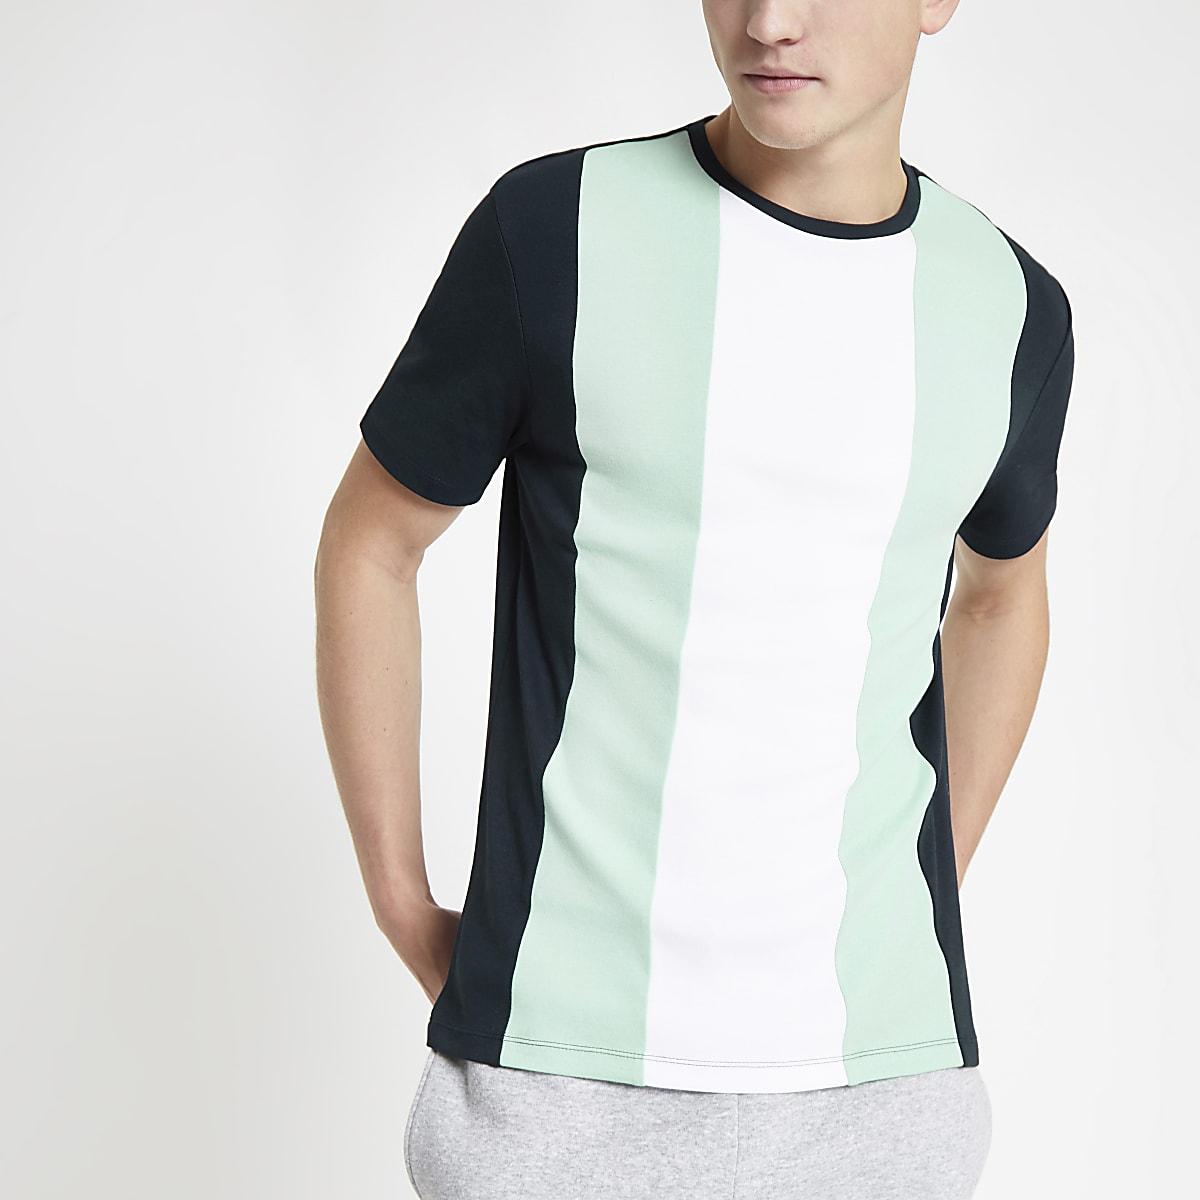 Groen slim-fit T-shirt met verticale kleurvlakken